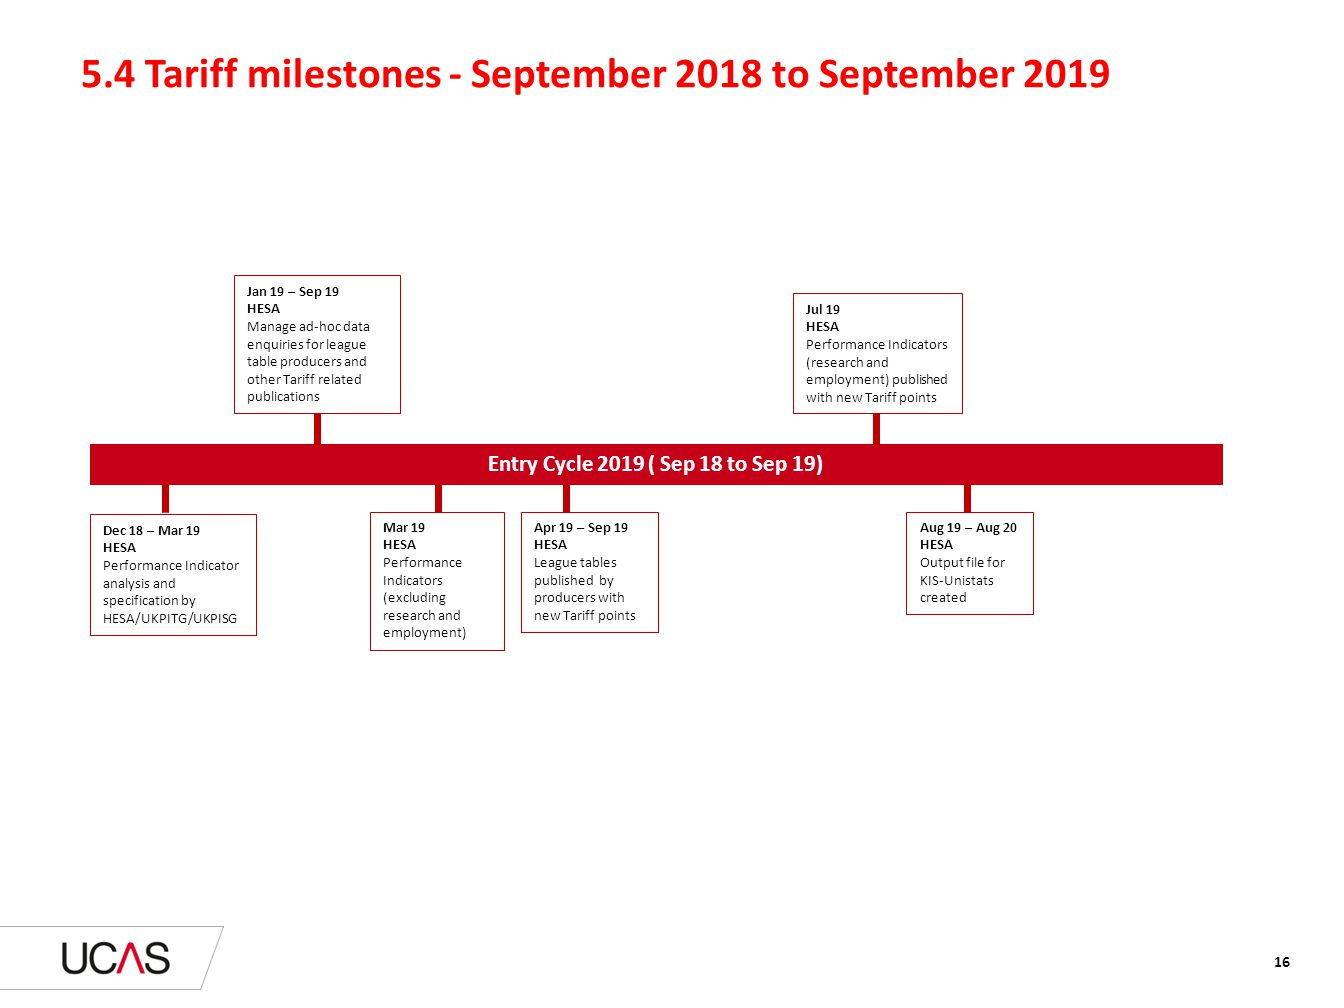 5.4 Tariff milestones - September 2018 to September 2019 16 Dec 18 – Mar 19 HESA Performance Indicator analysis and specification by HESA/UKPITG/UKPIS